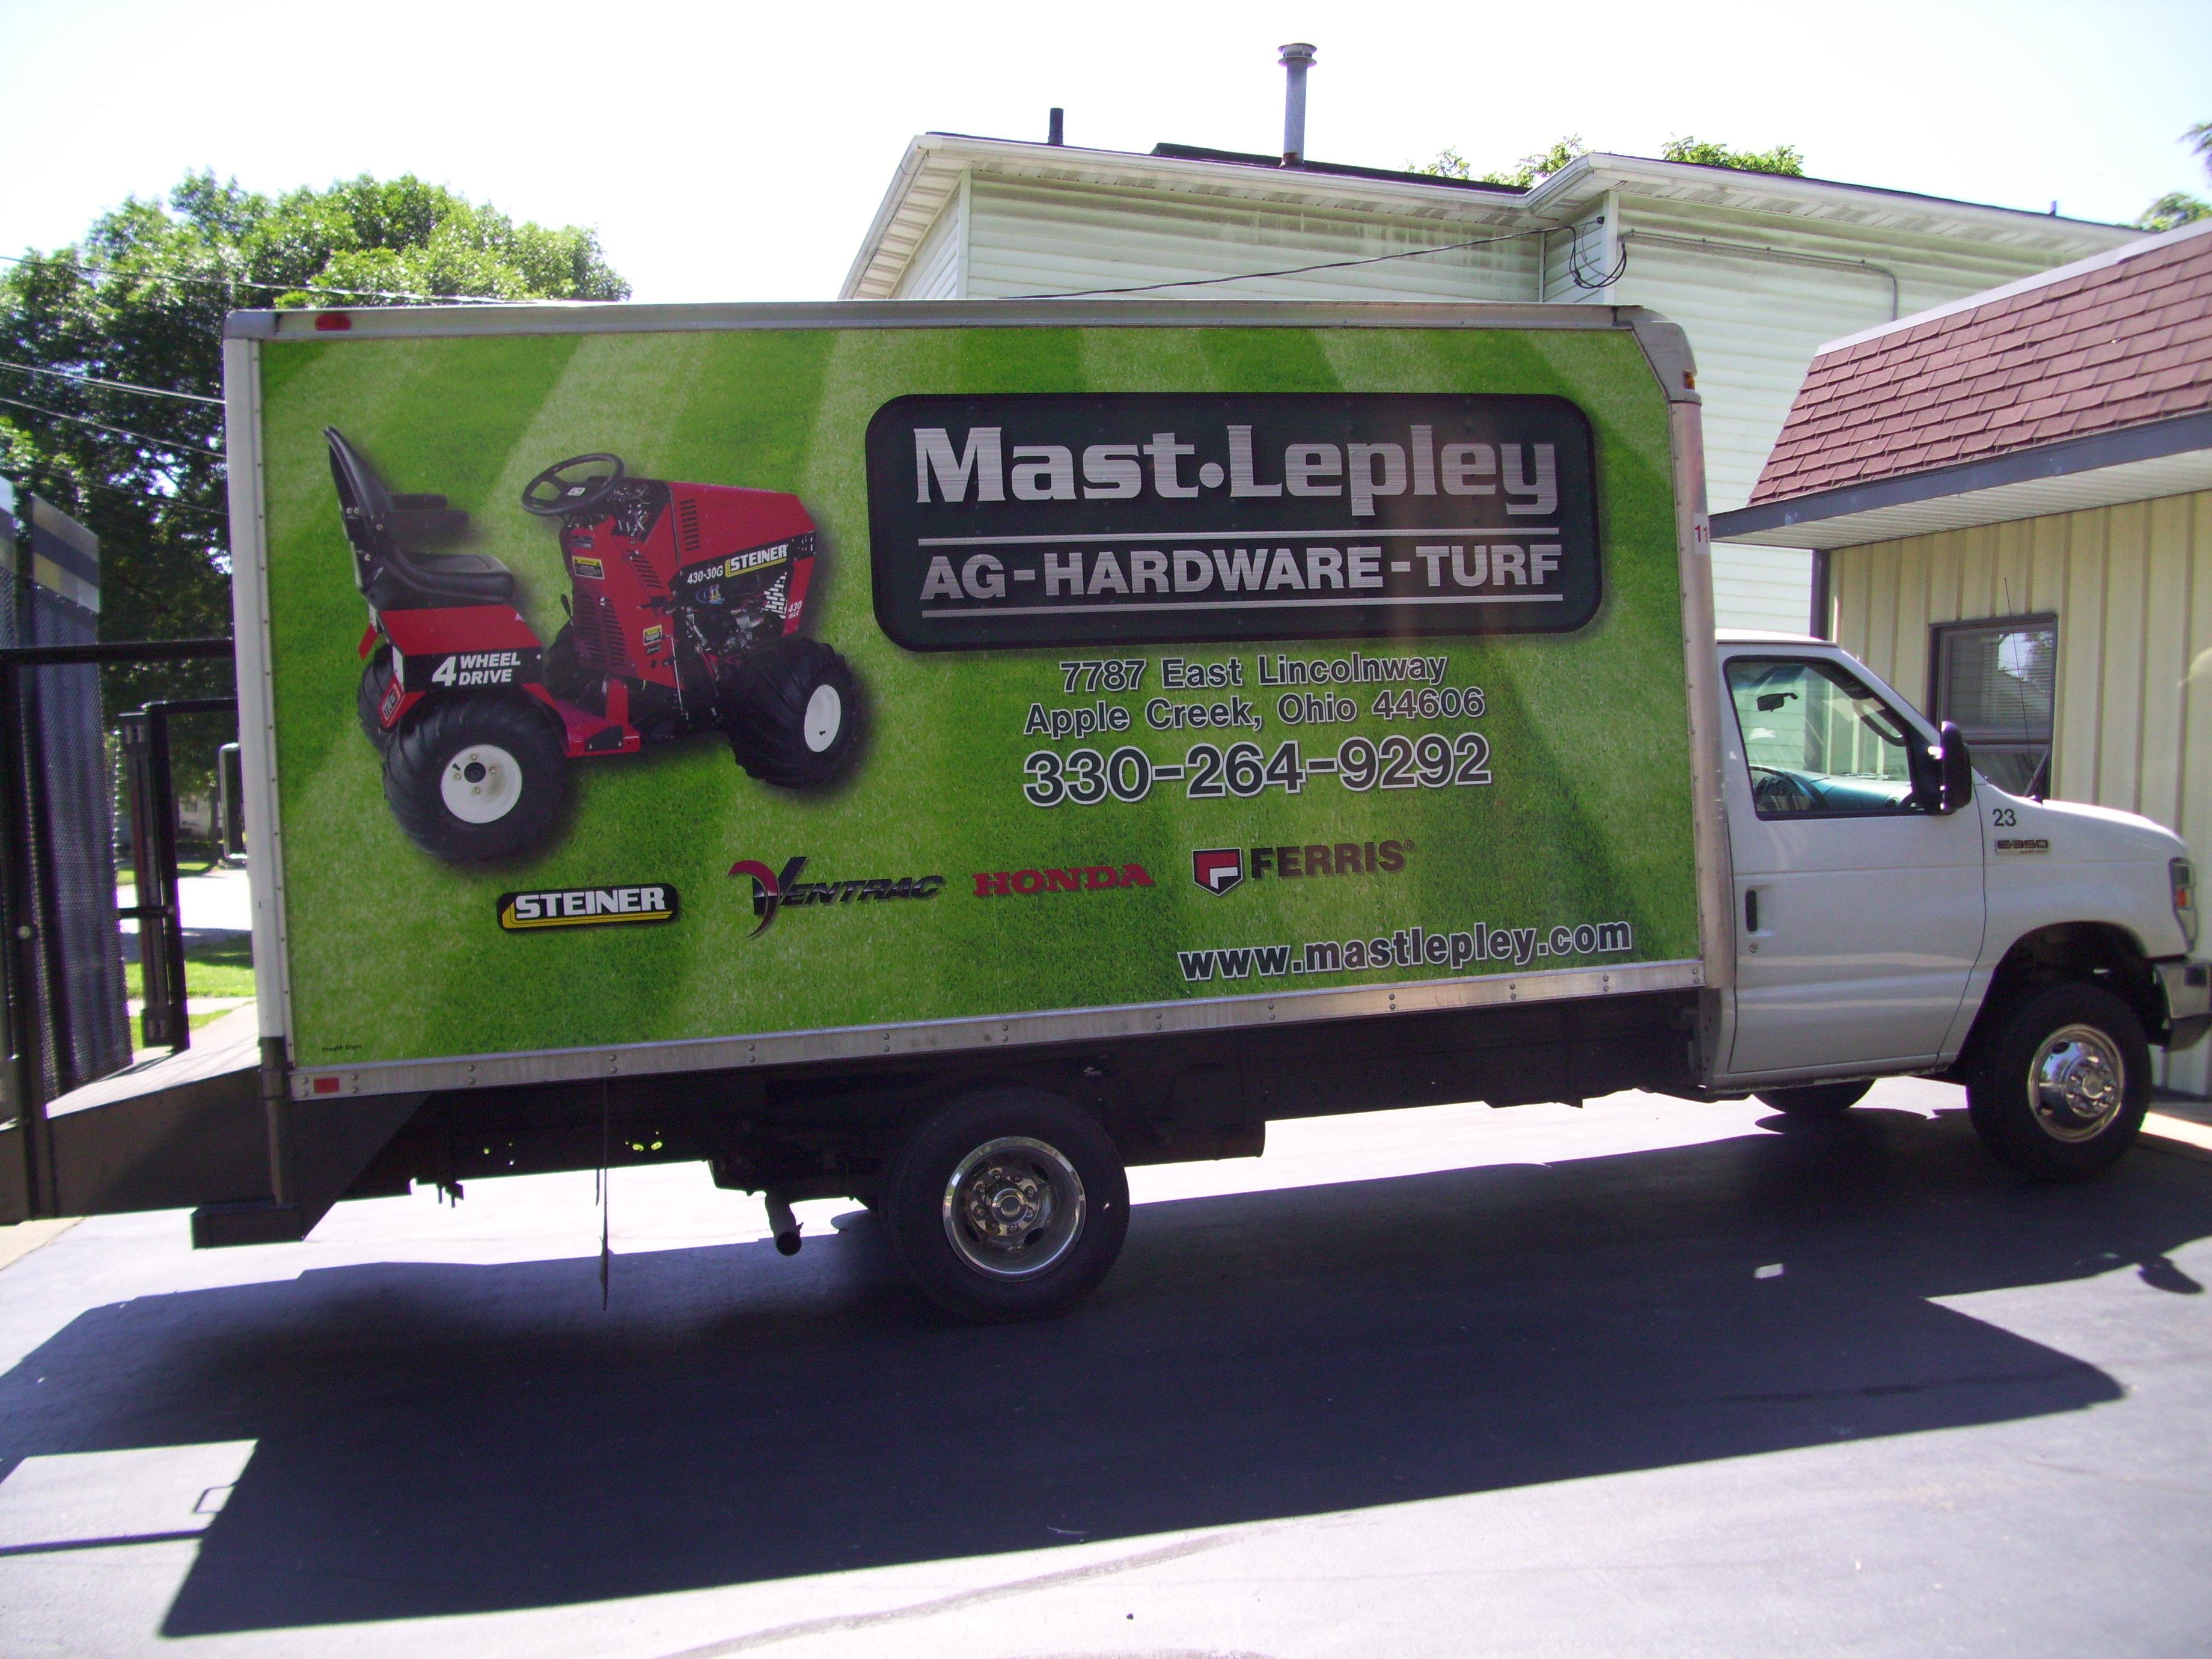 Mast Lepley Box Truck